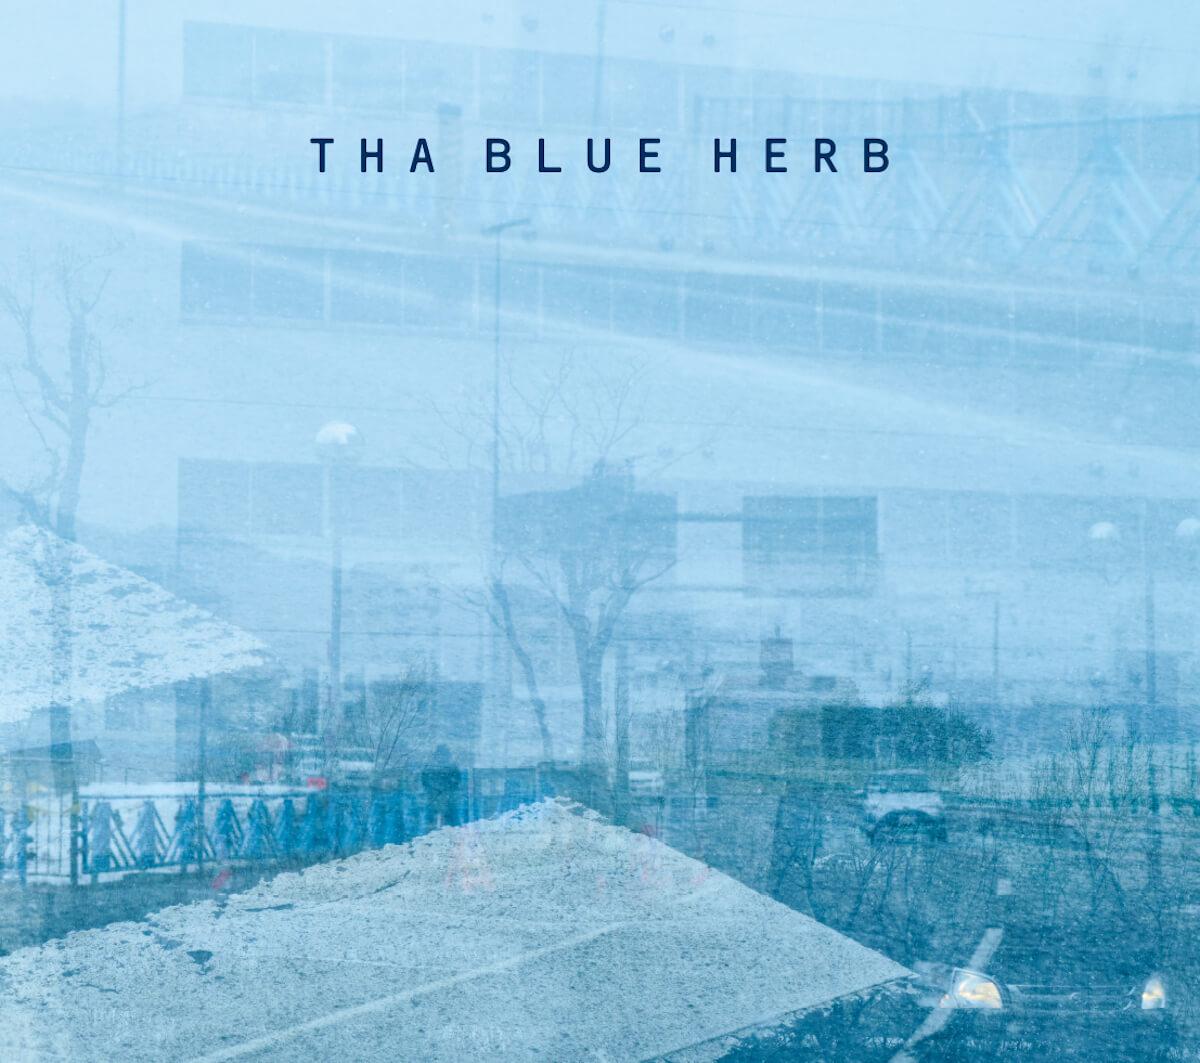 THA BLUE HERB、ニューアルバム『THA BLUE HERB』収録曲&アートワーク公開|ツアー日程も解禁 music190601thablueherb-album_1